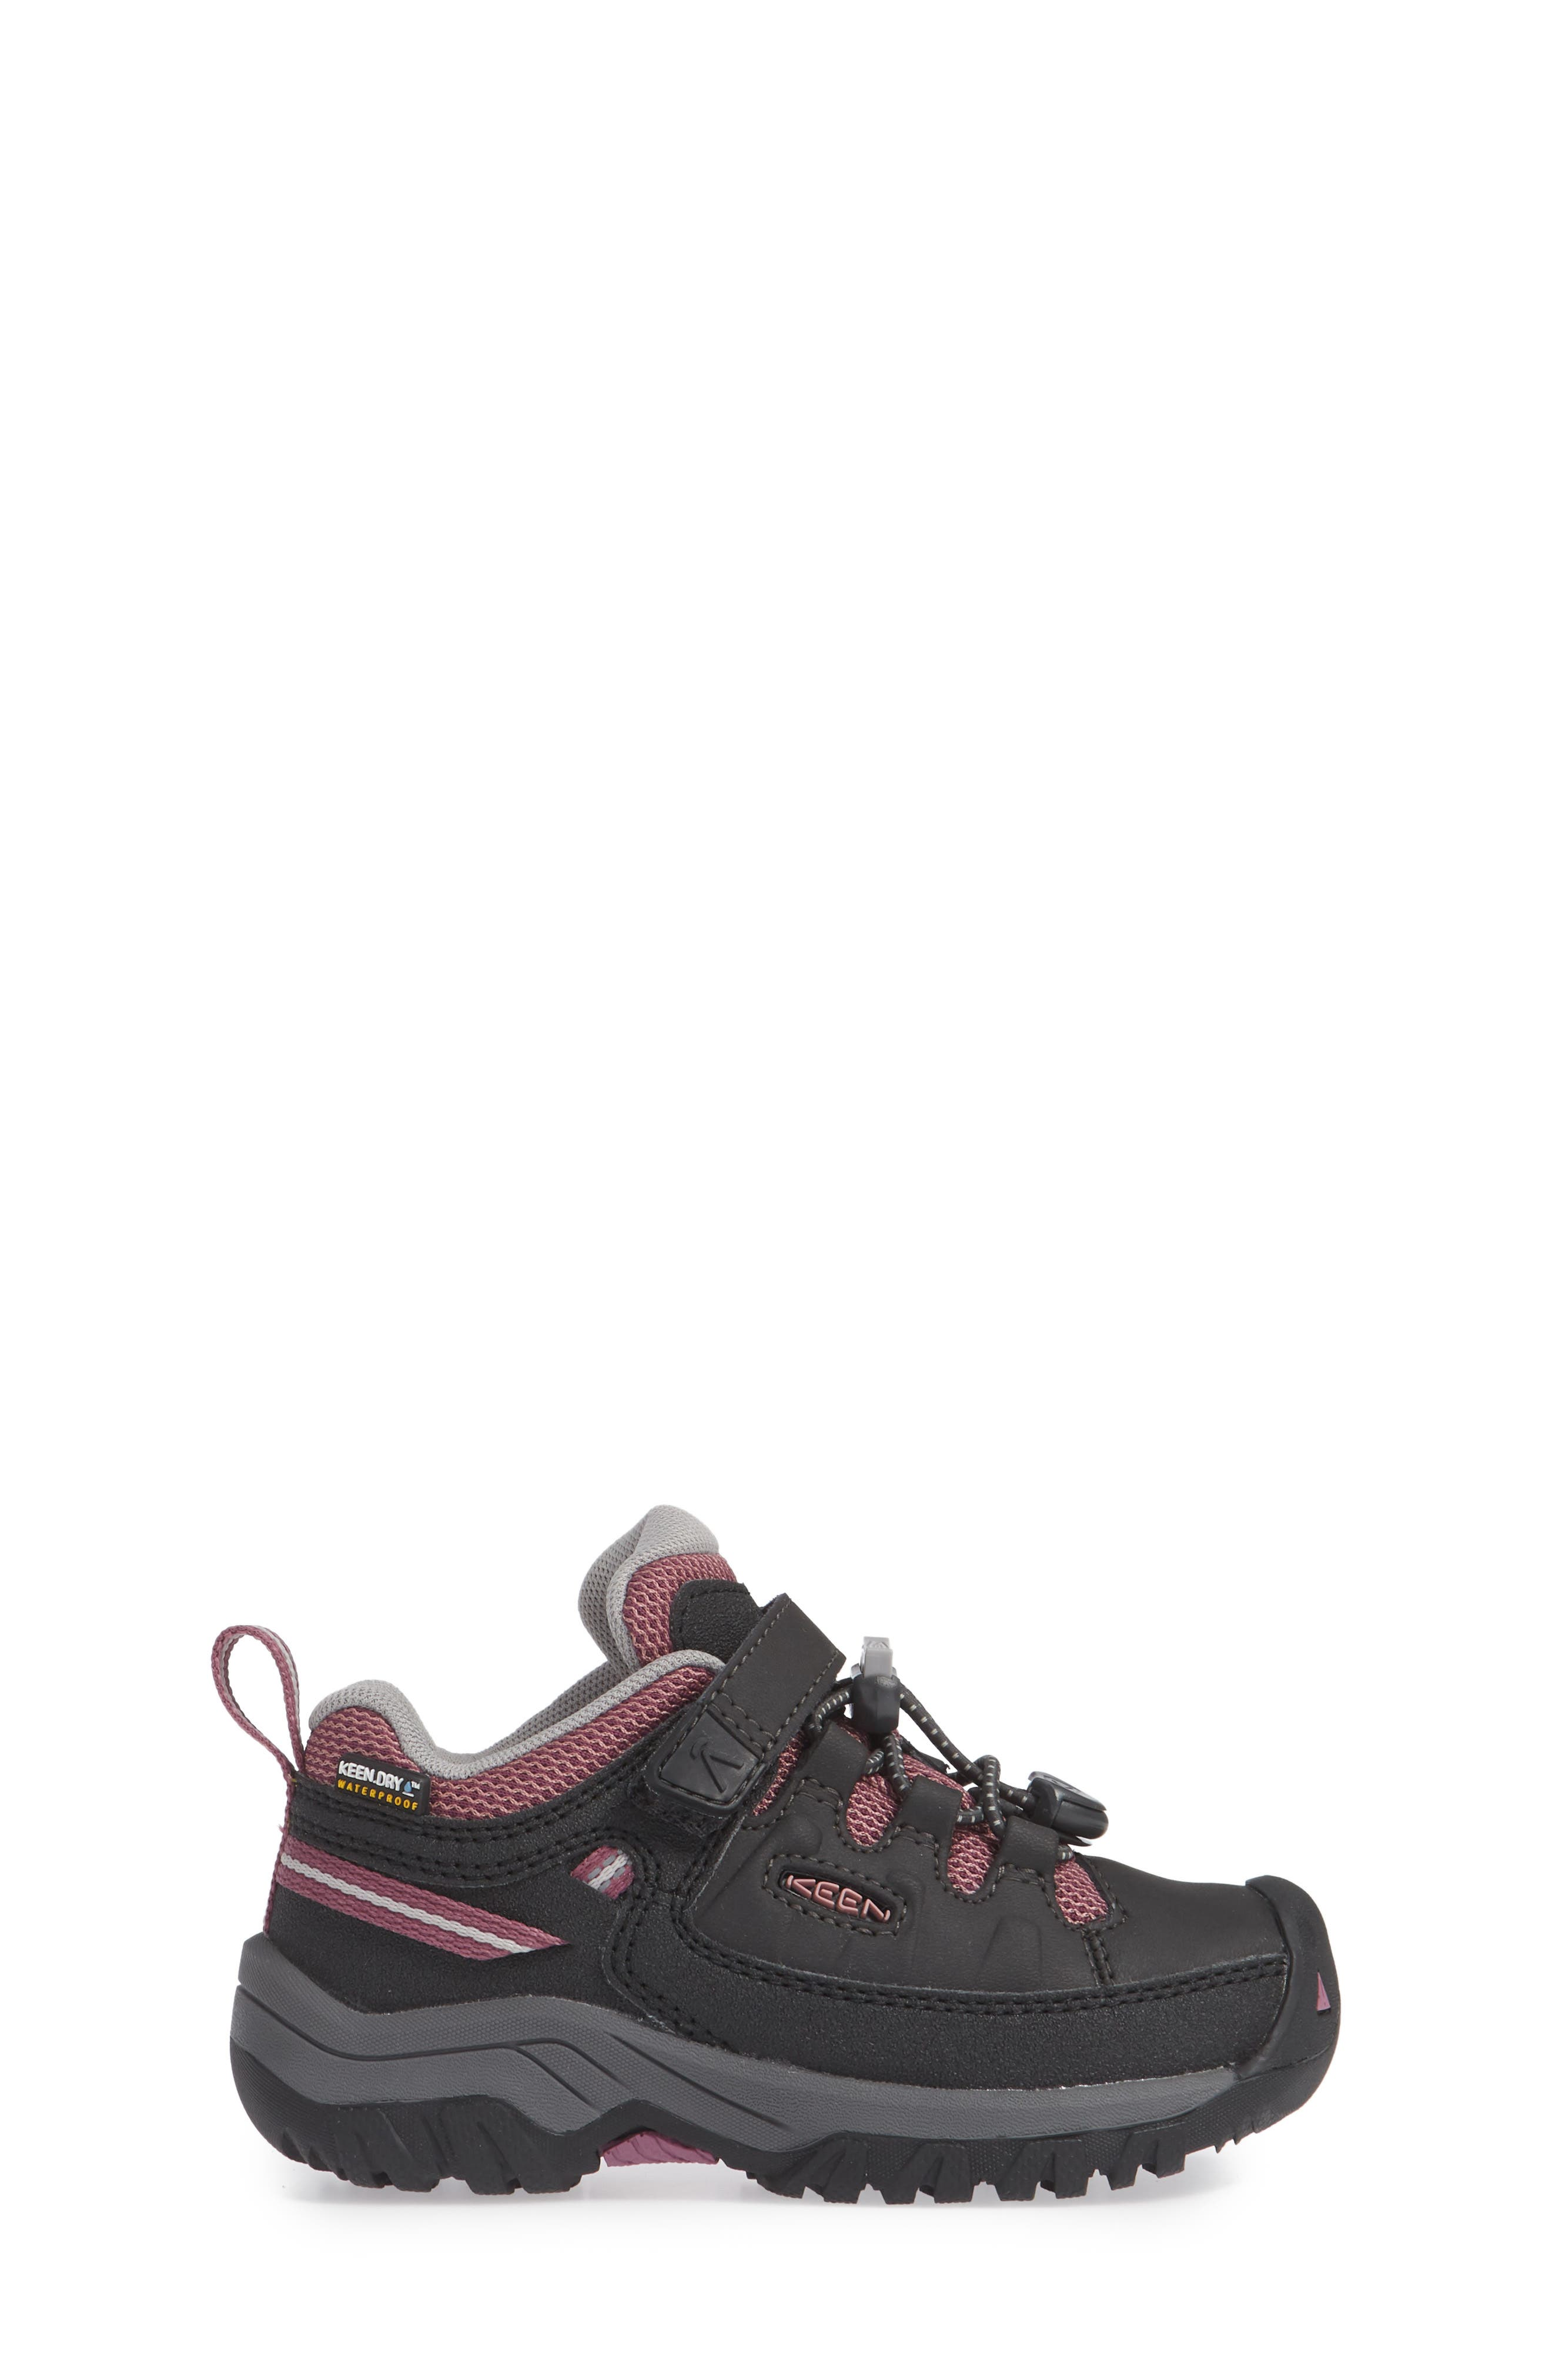 KEEN, Targhee Low Waterproof Sneaker, Alternate thumbnail 3, color, RAVEN/ TULIPWOOD